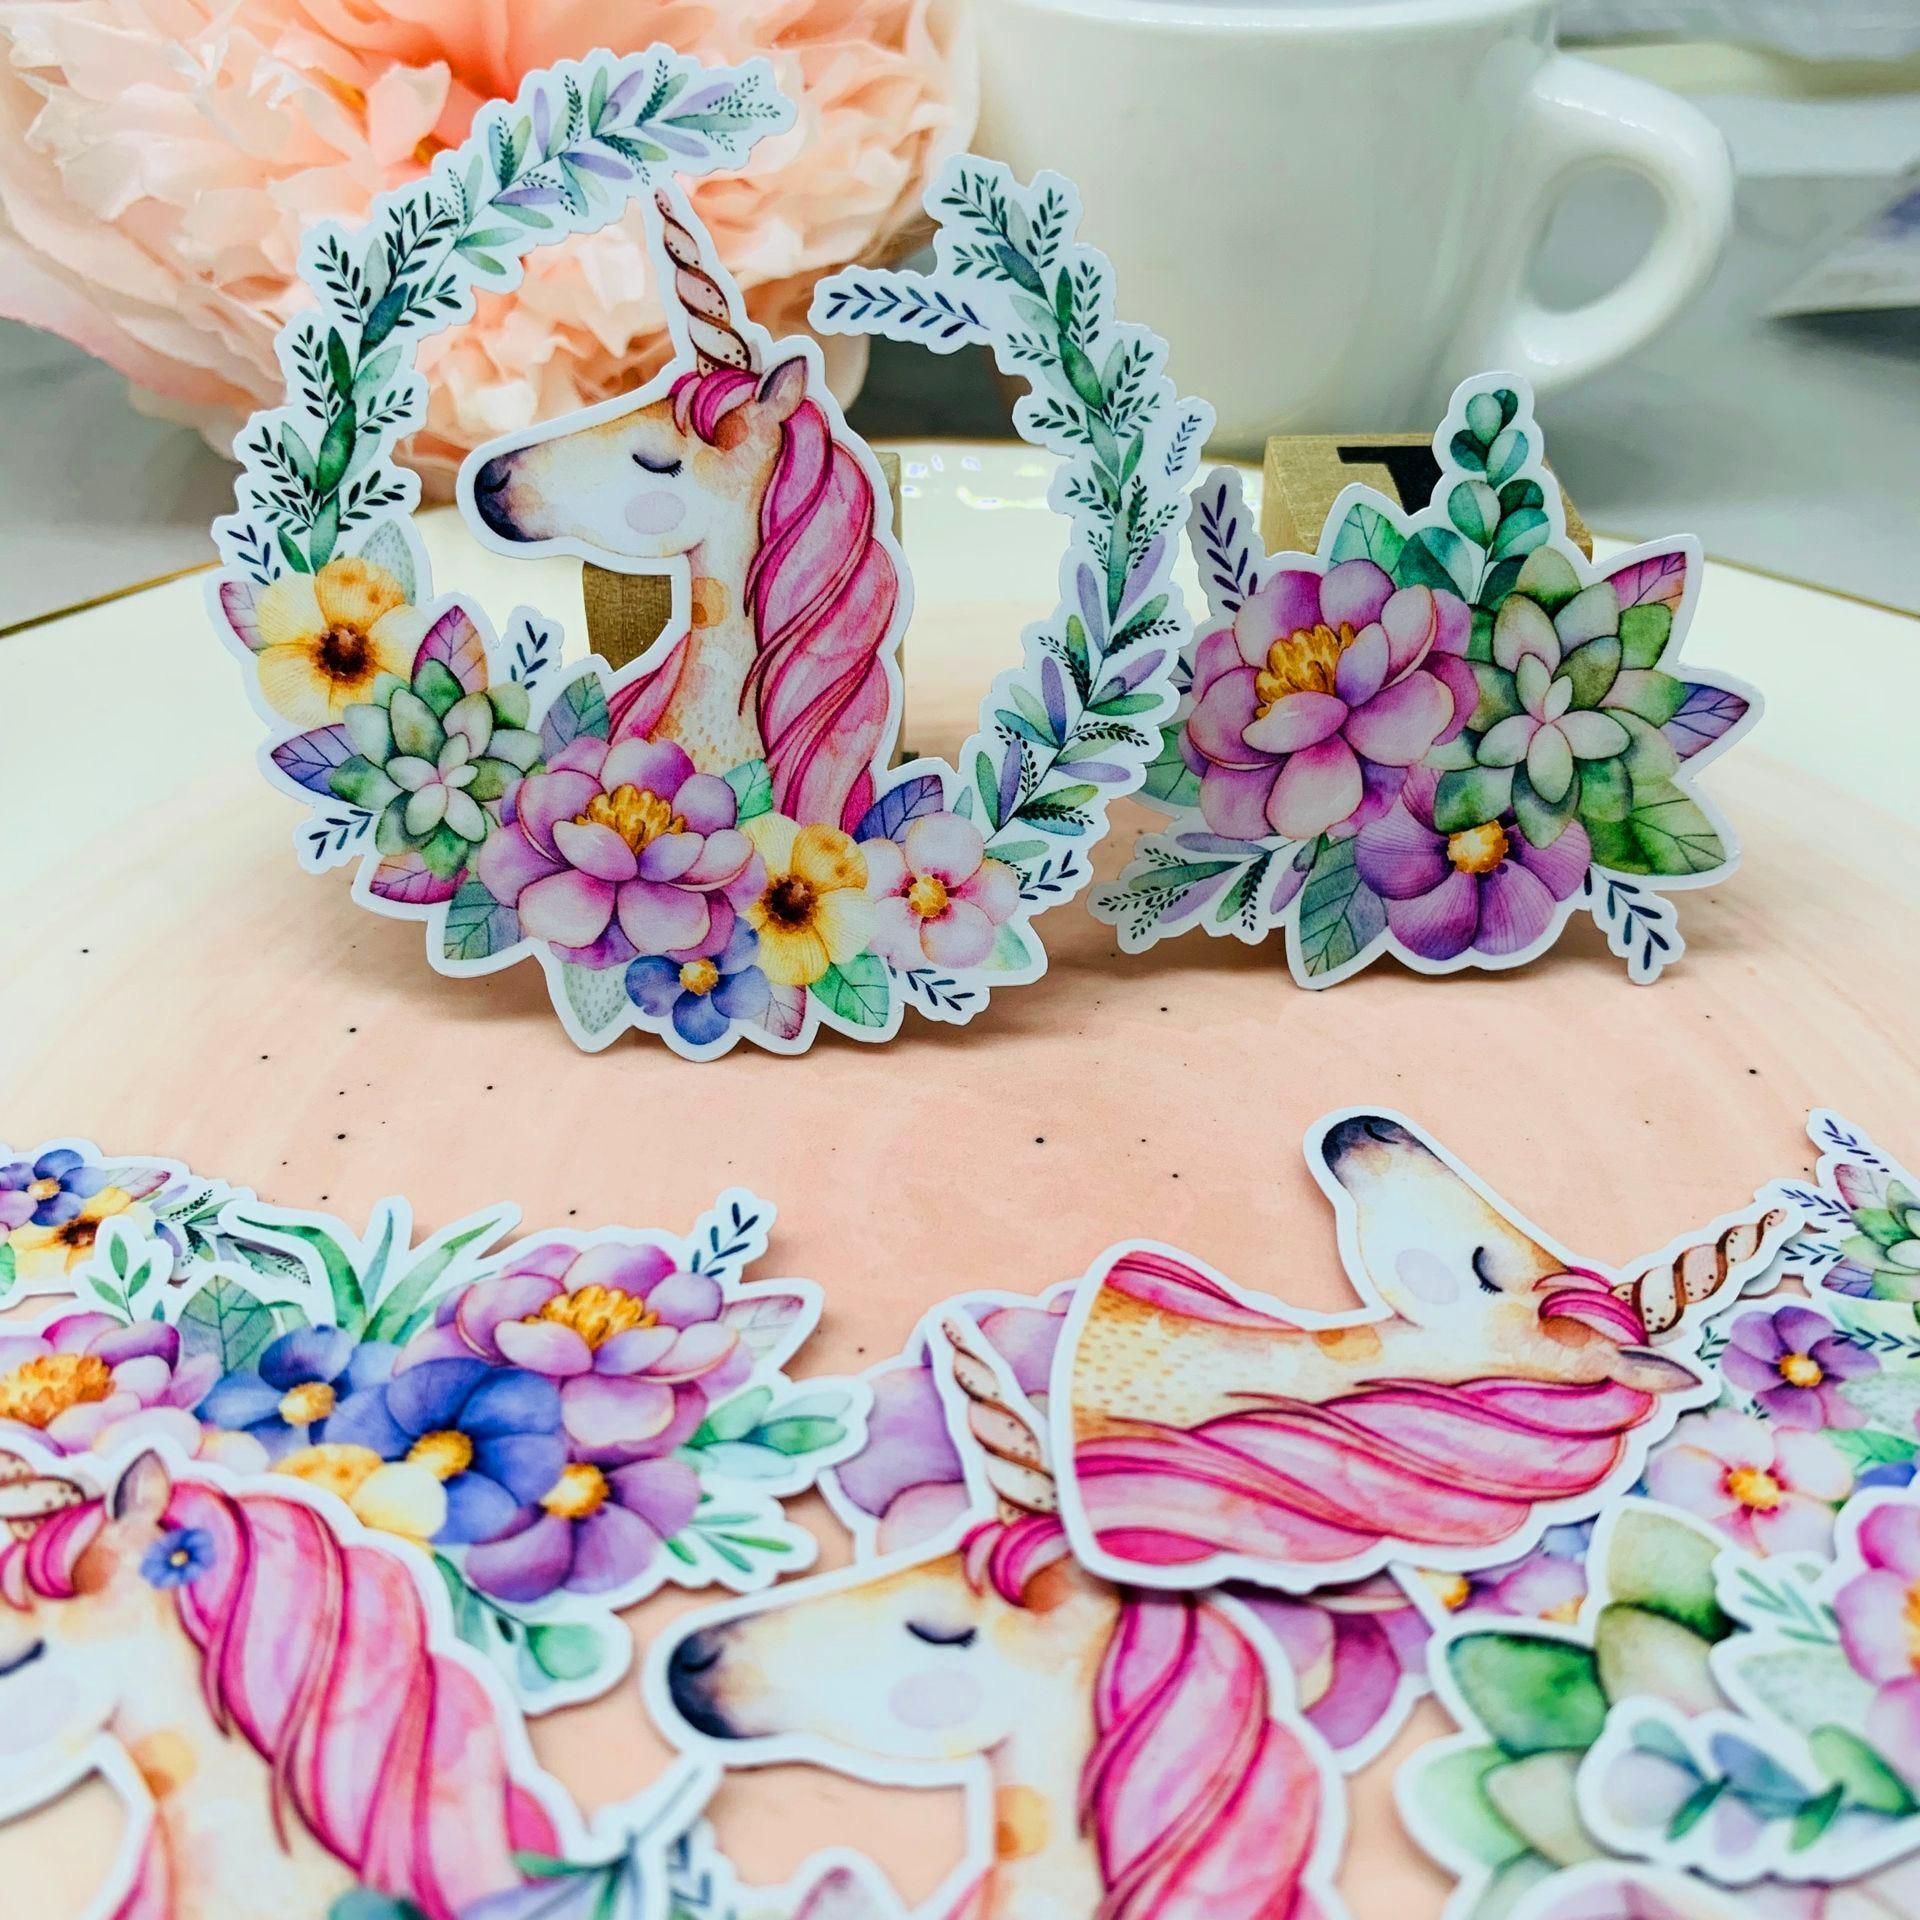 32 Pcs Flower Unicorn Sticker For Kid Homemade Book Stickers On Laptop / Decorative Scrapbooking